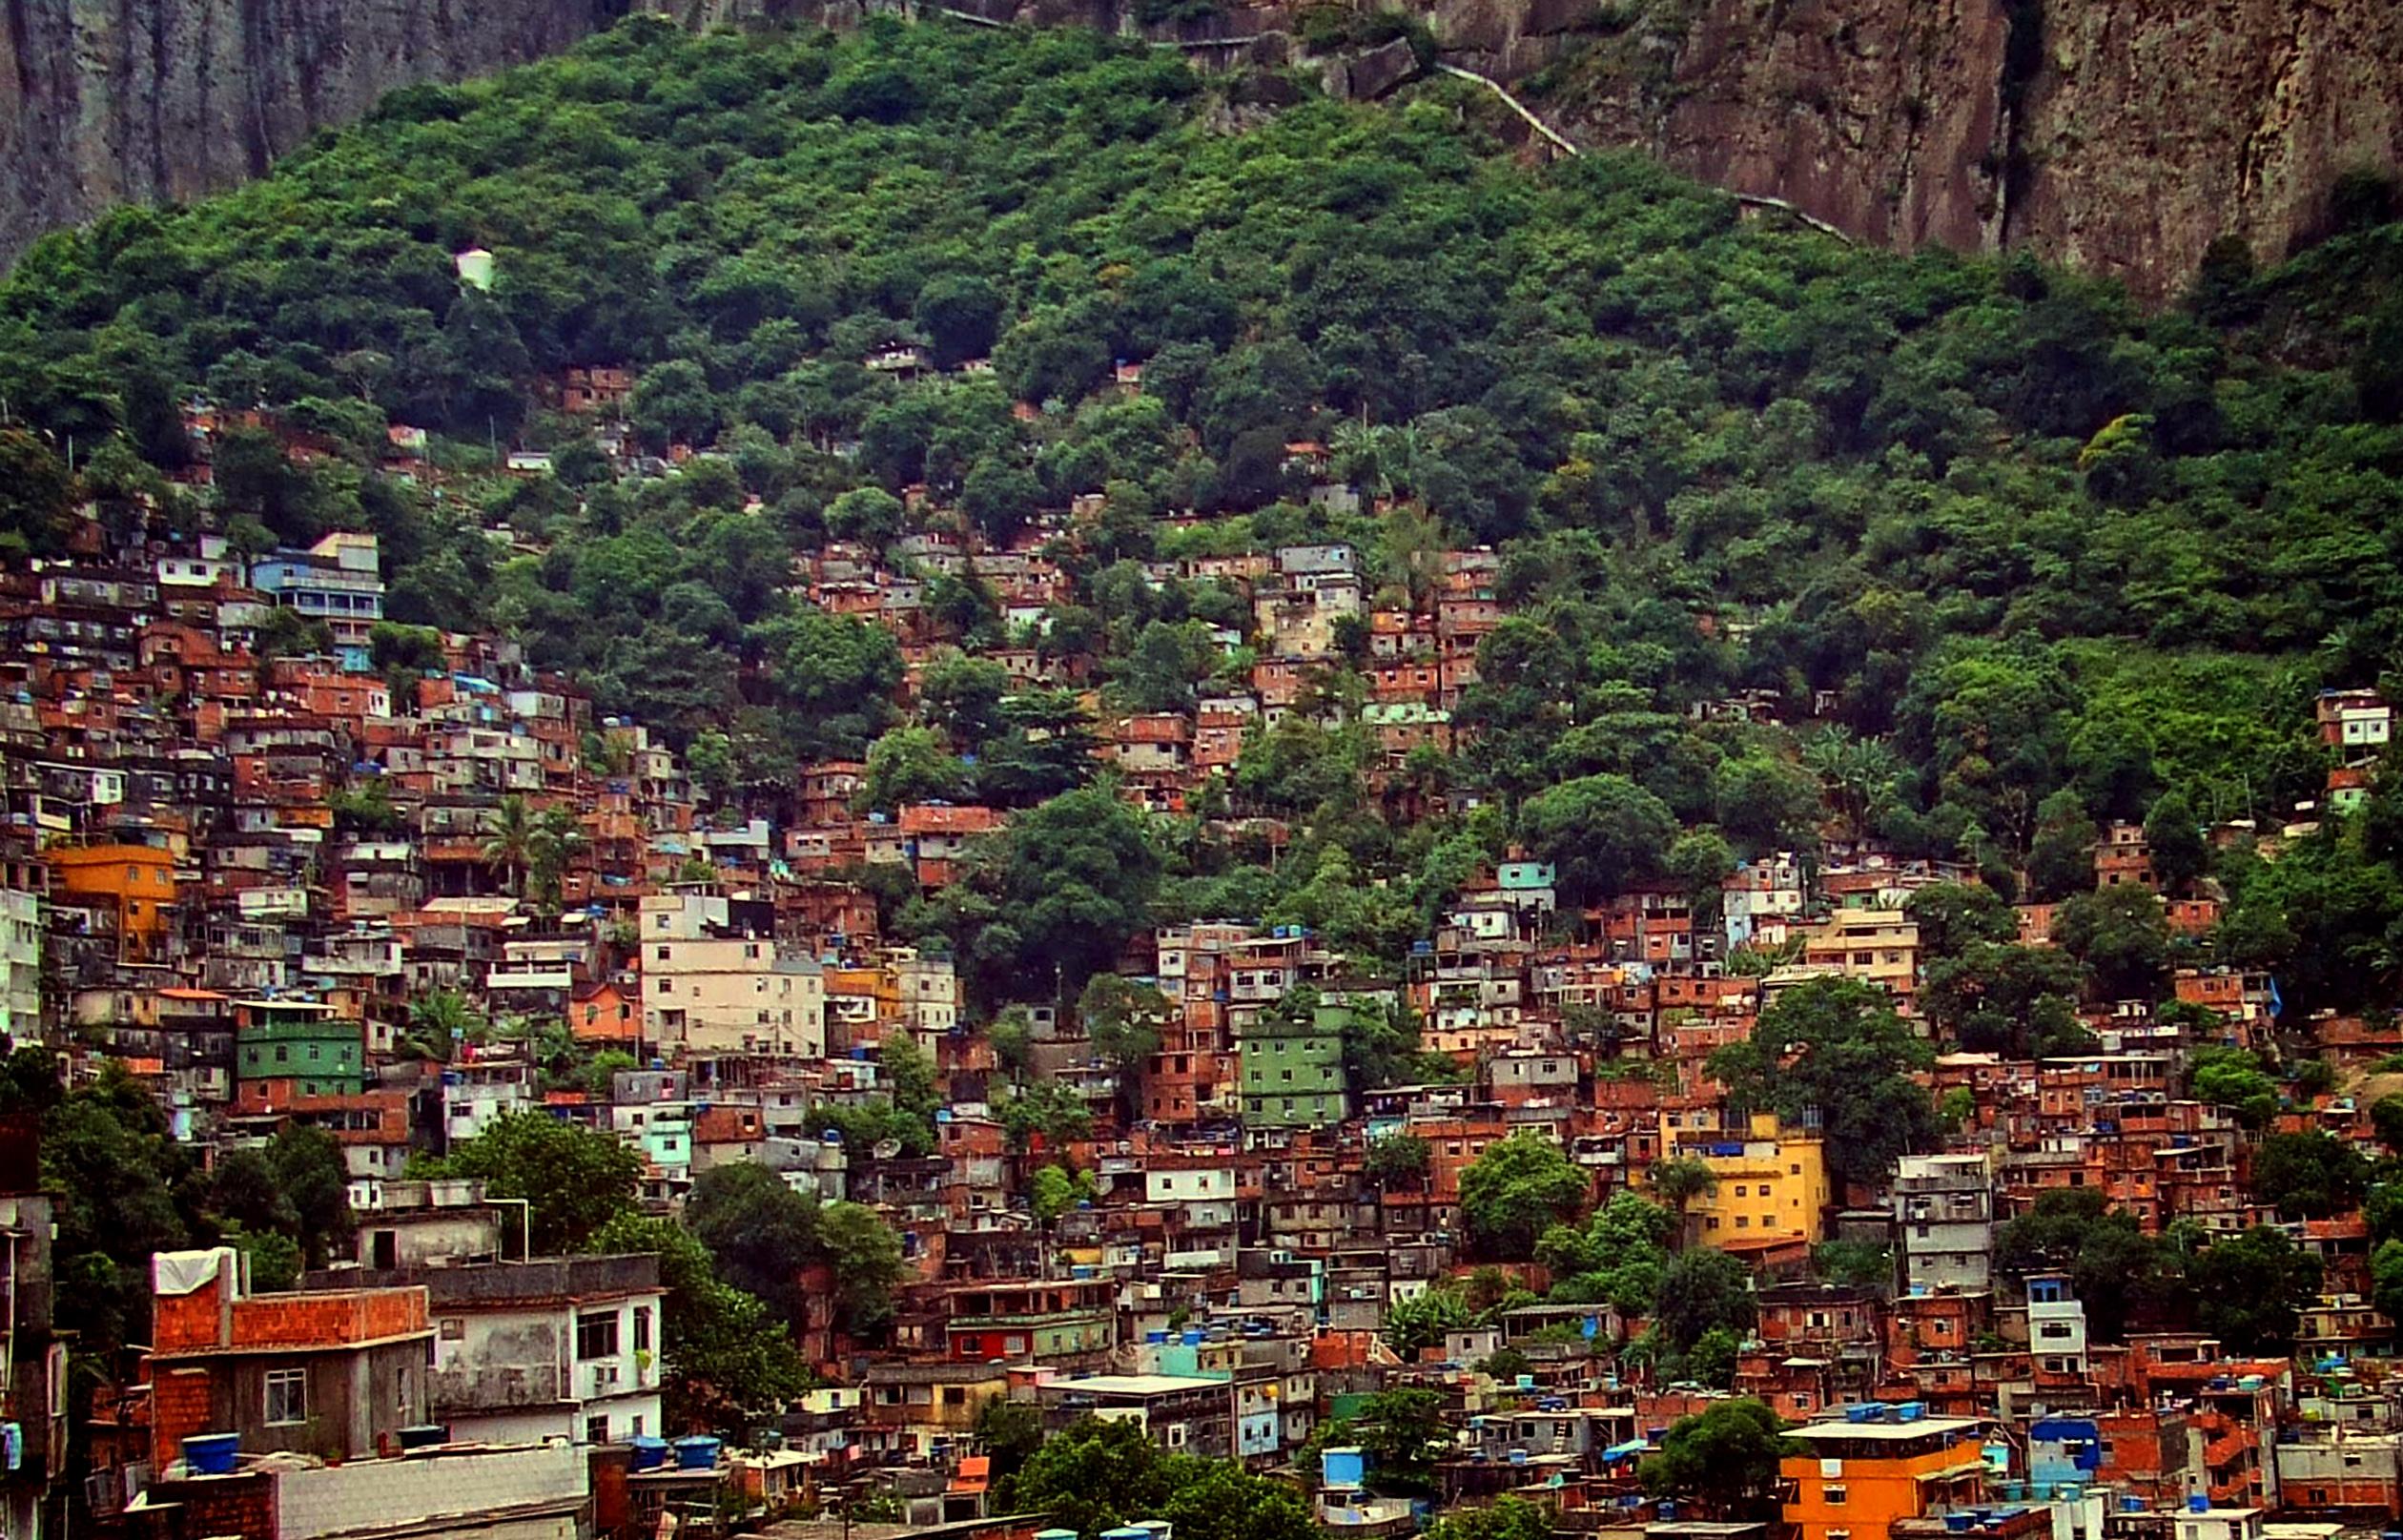 View over rocinha - the largest slum in latin america - rio de janeiro photo